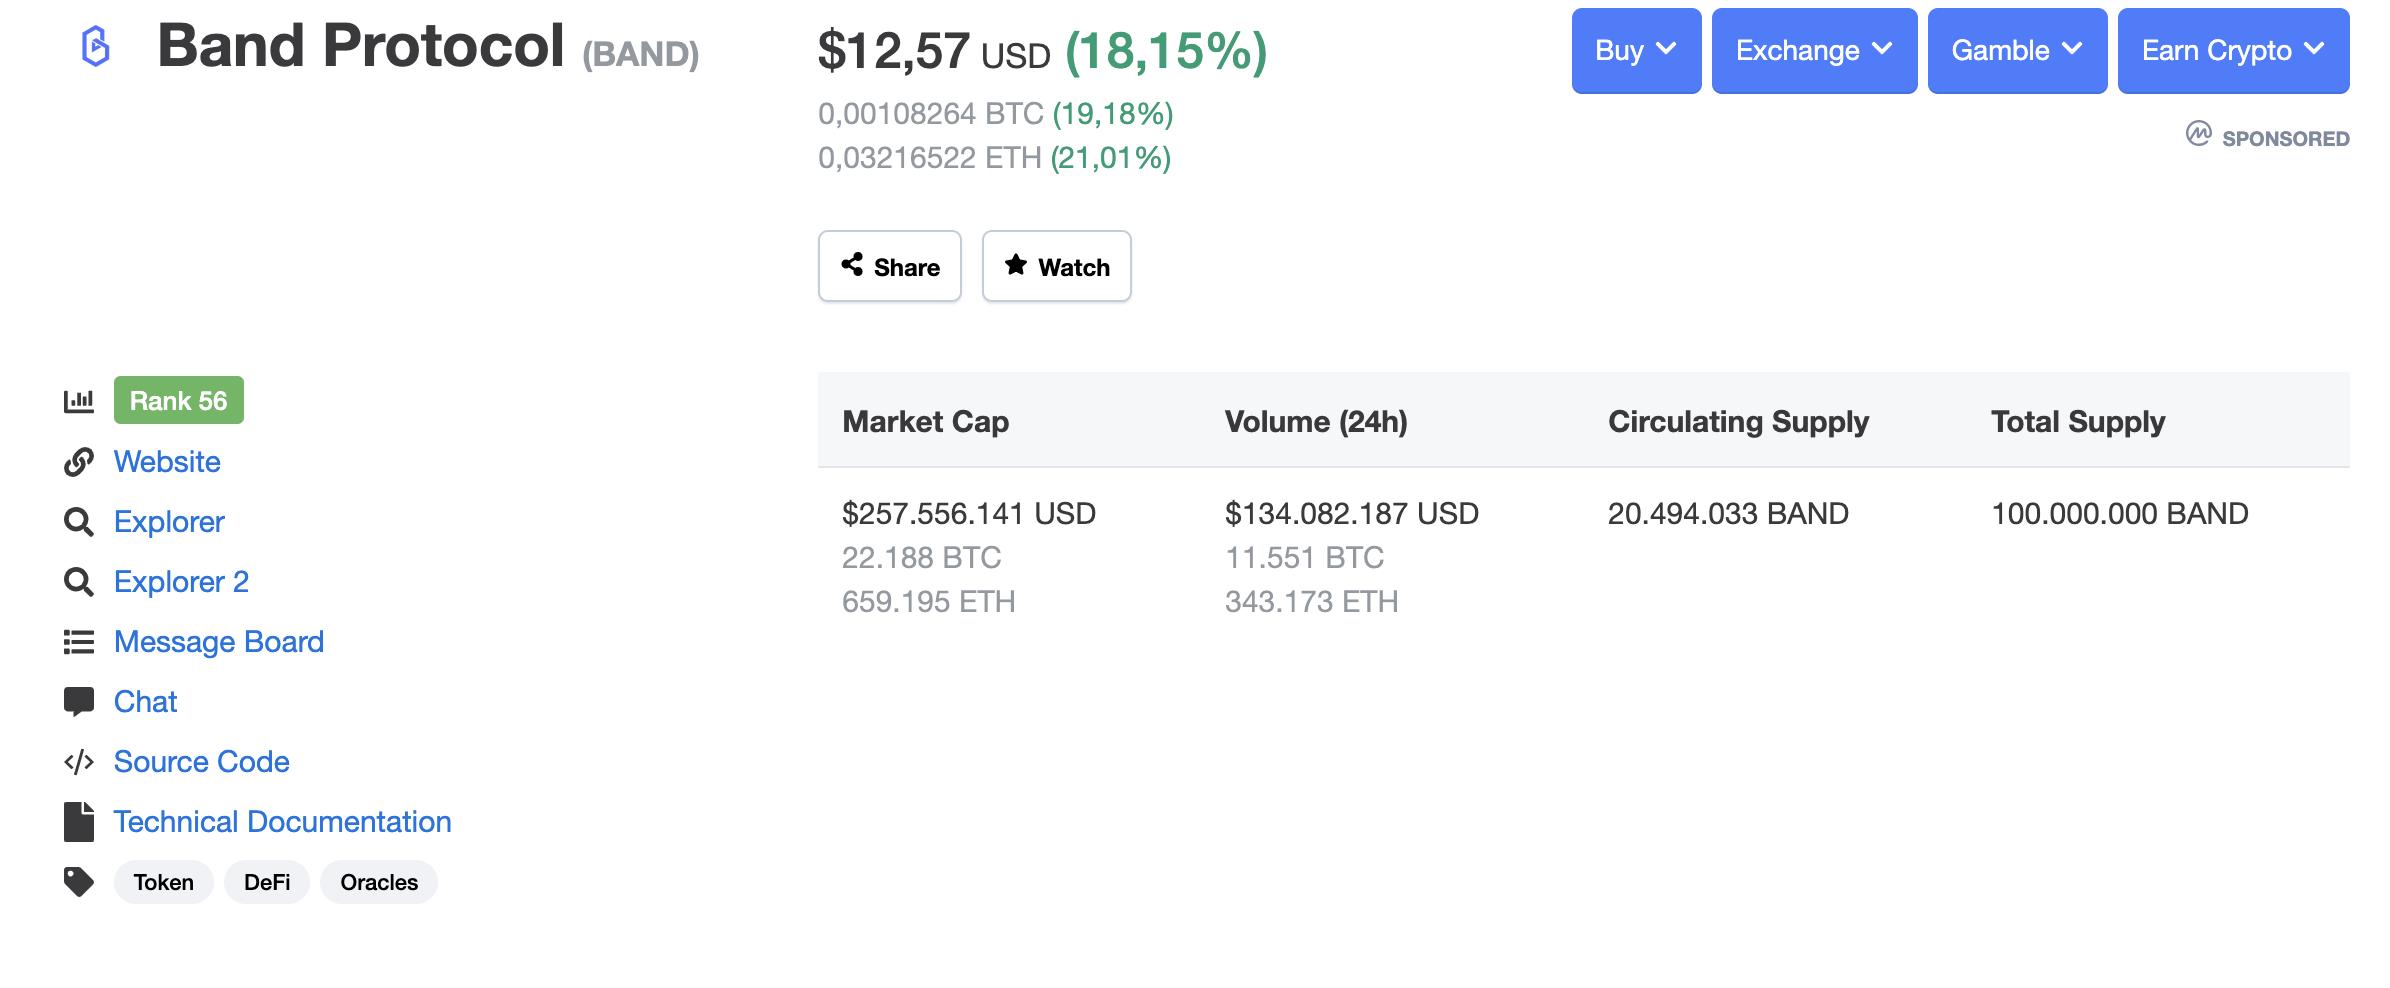 BAND Protocol's price and market cap according to coinmarketcap